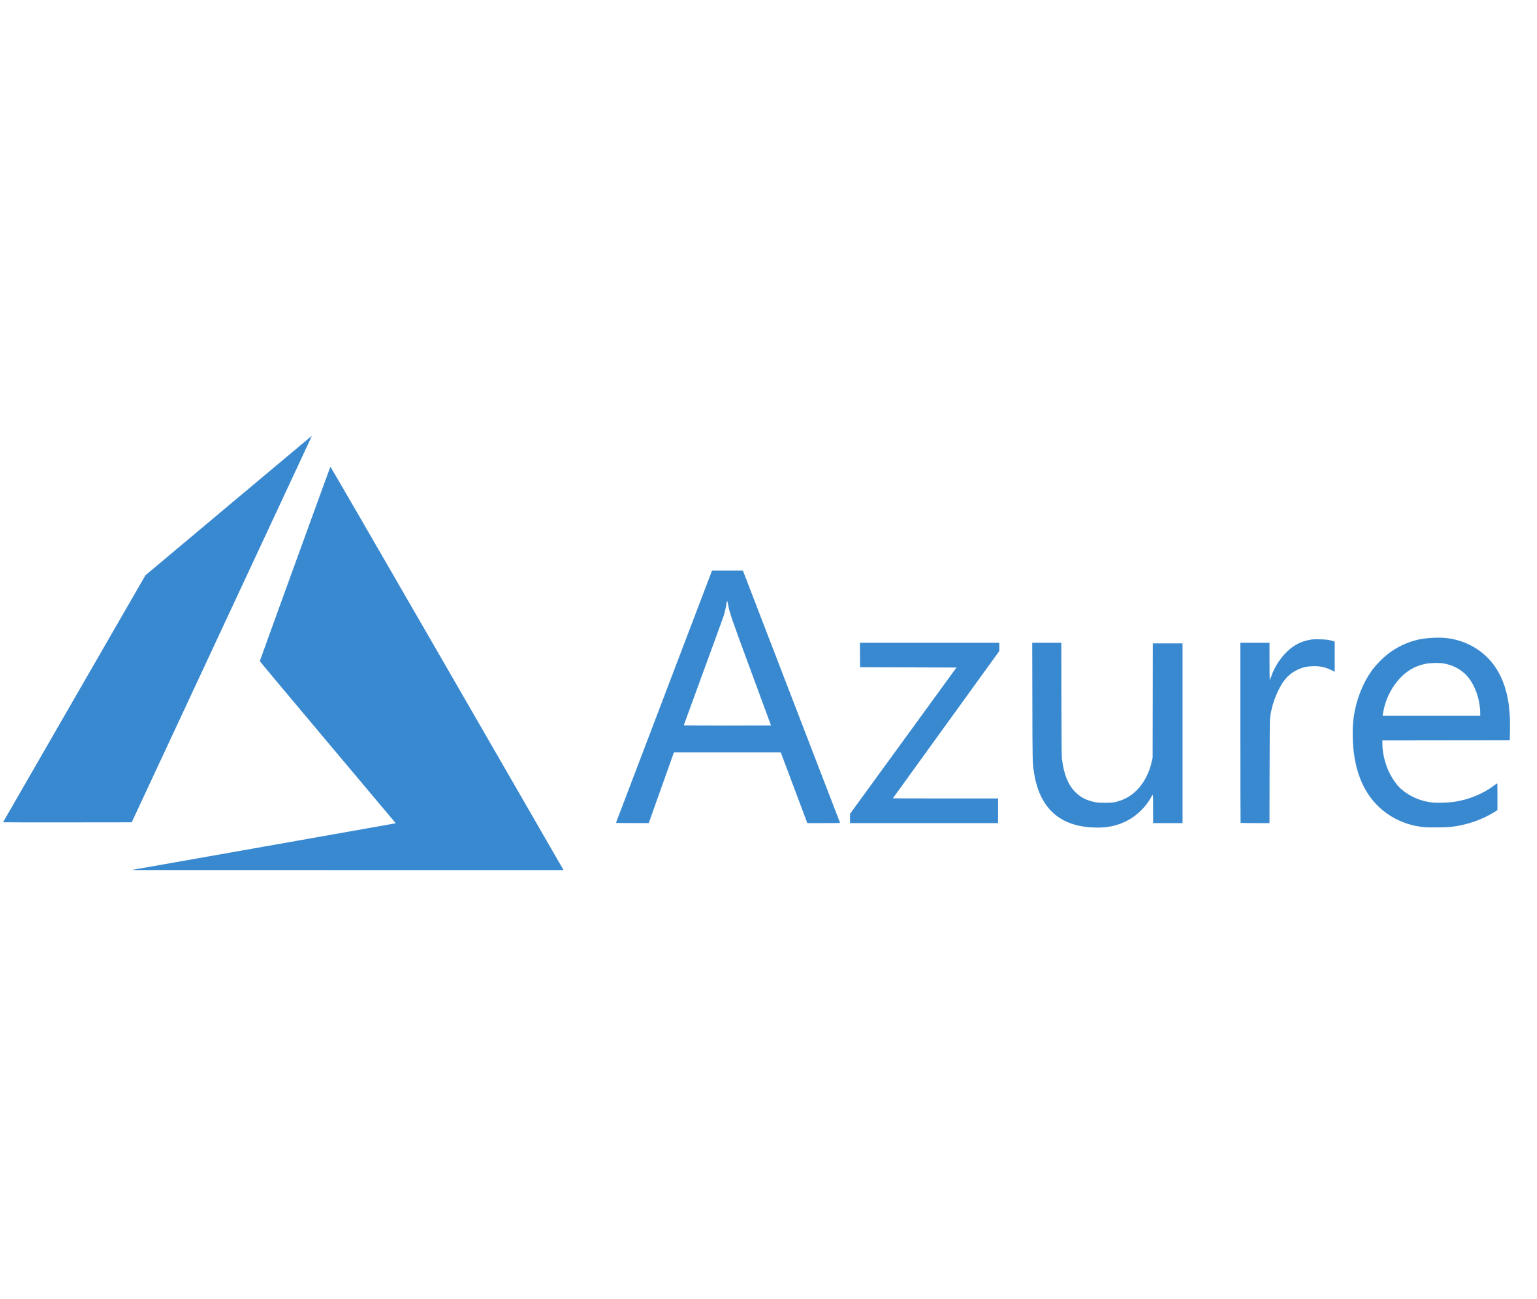 Microsoft azure logo.wine